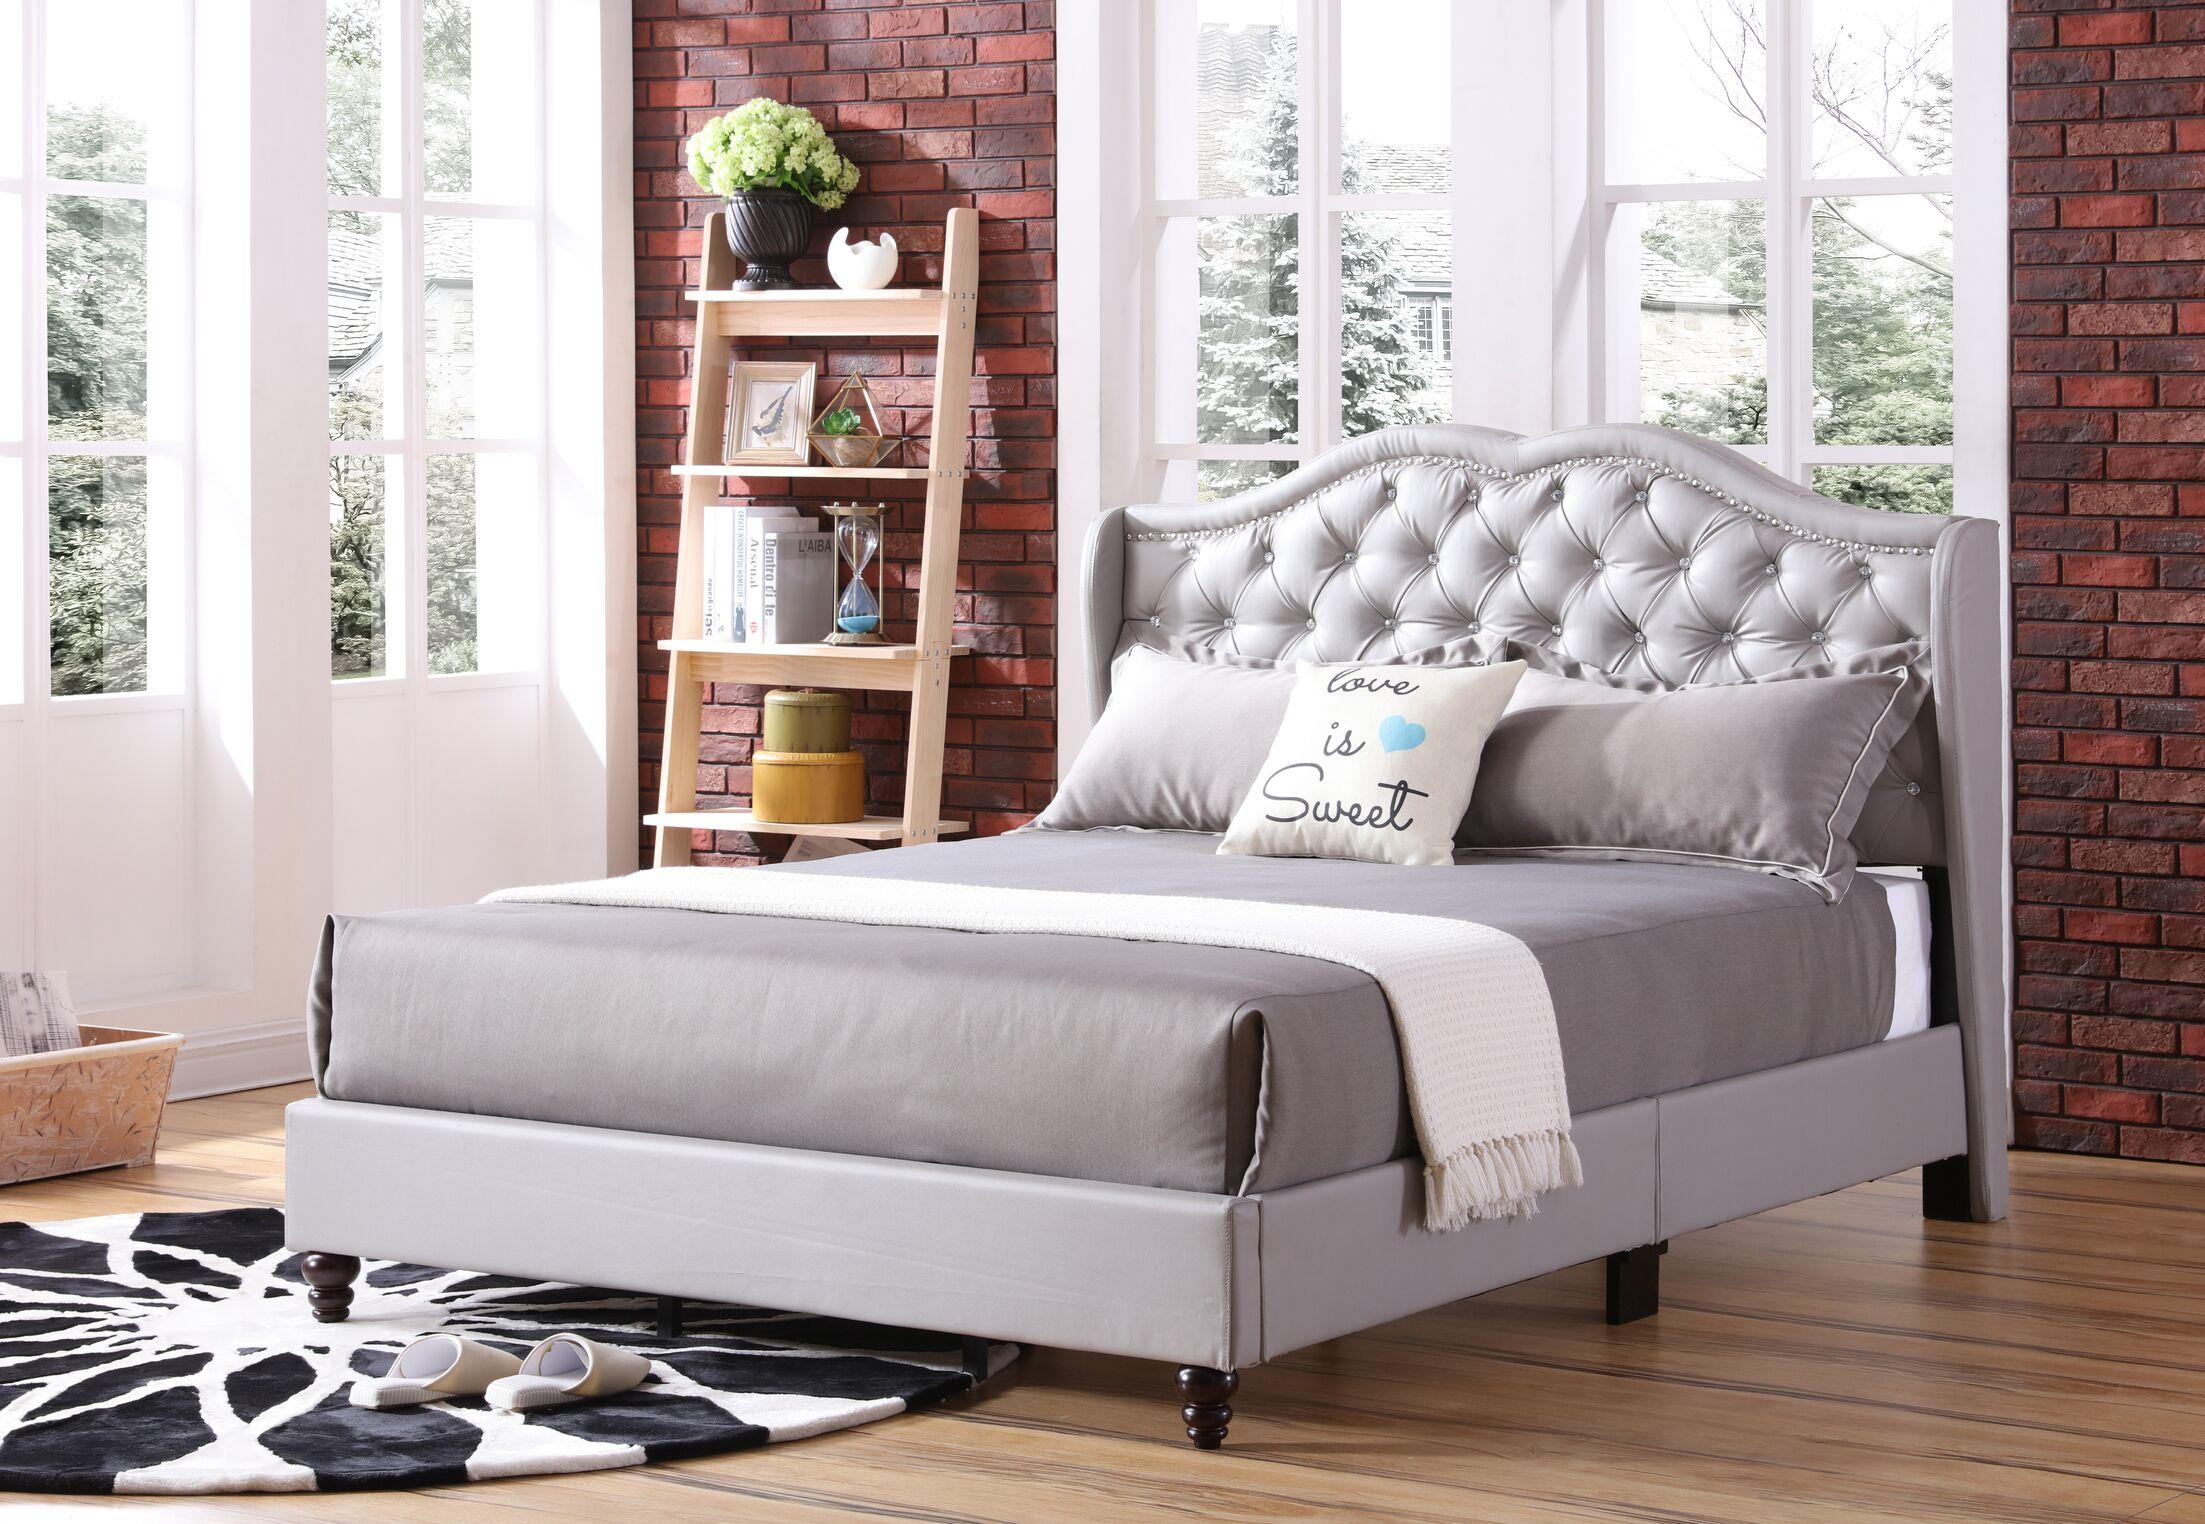 Cobbett Upholstered Panel Bed Size: King, Color: Gray